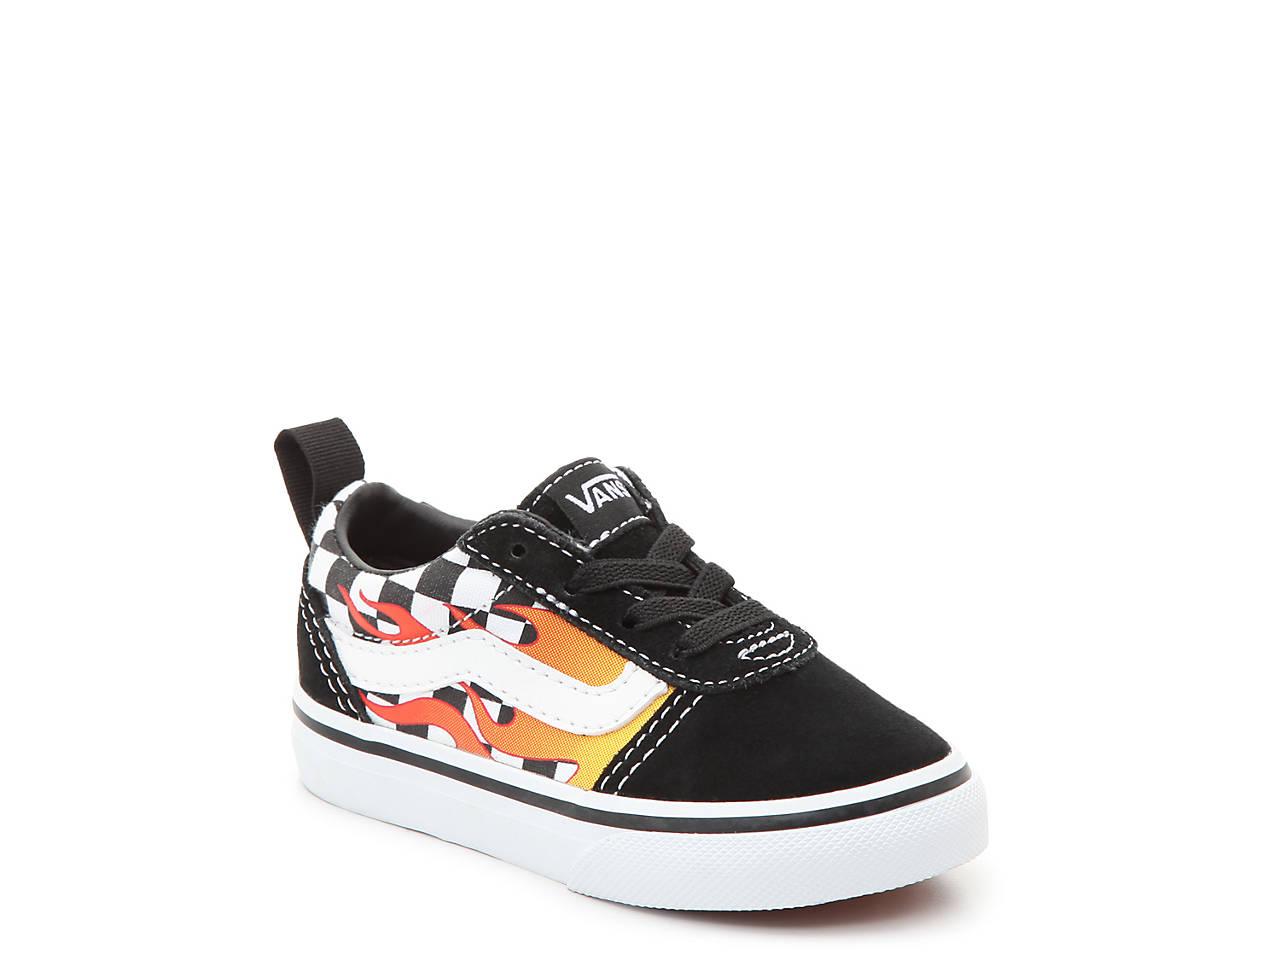 Vans Ward Toddler Slip-On Sneaker Kids Shoes  0f2ba37fe